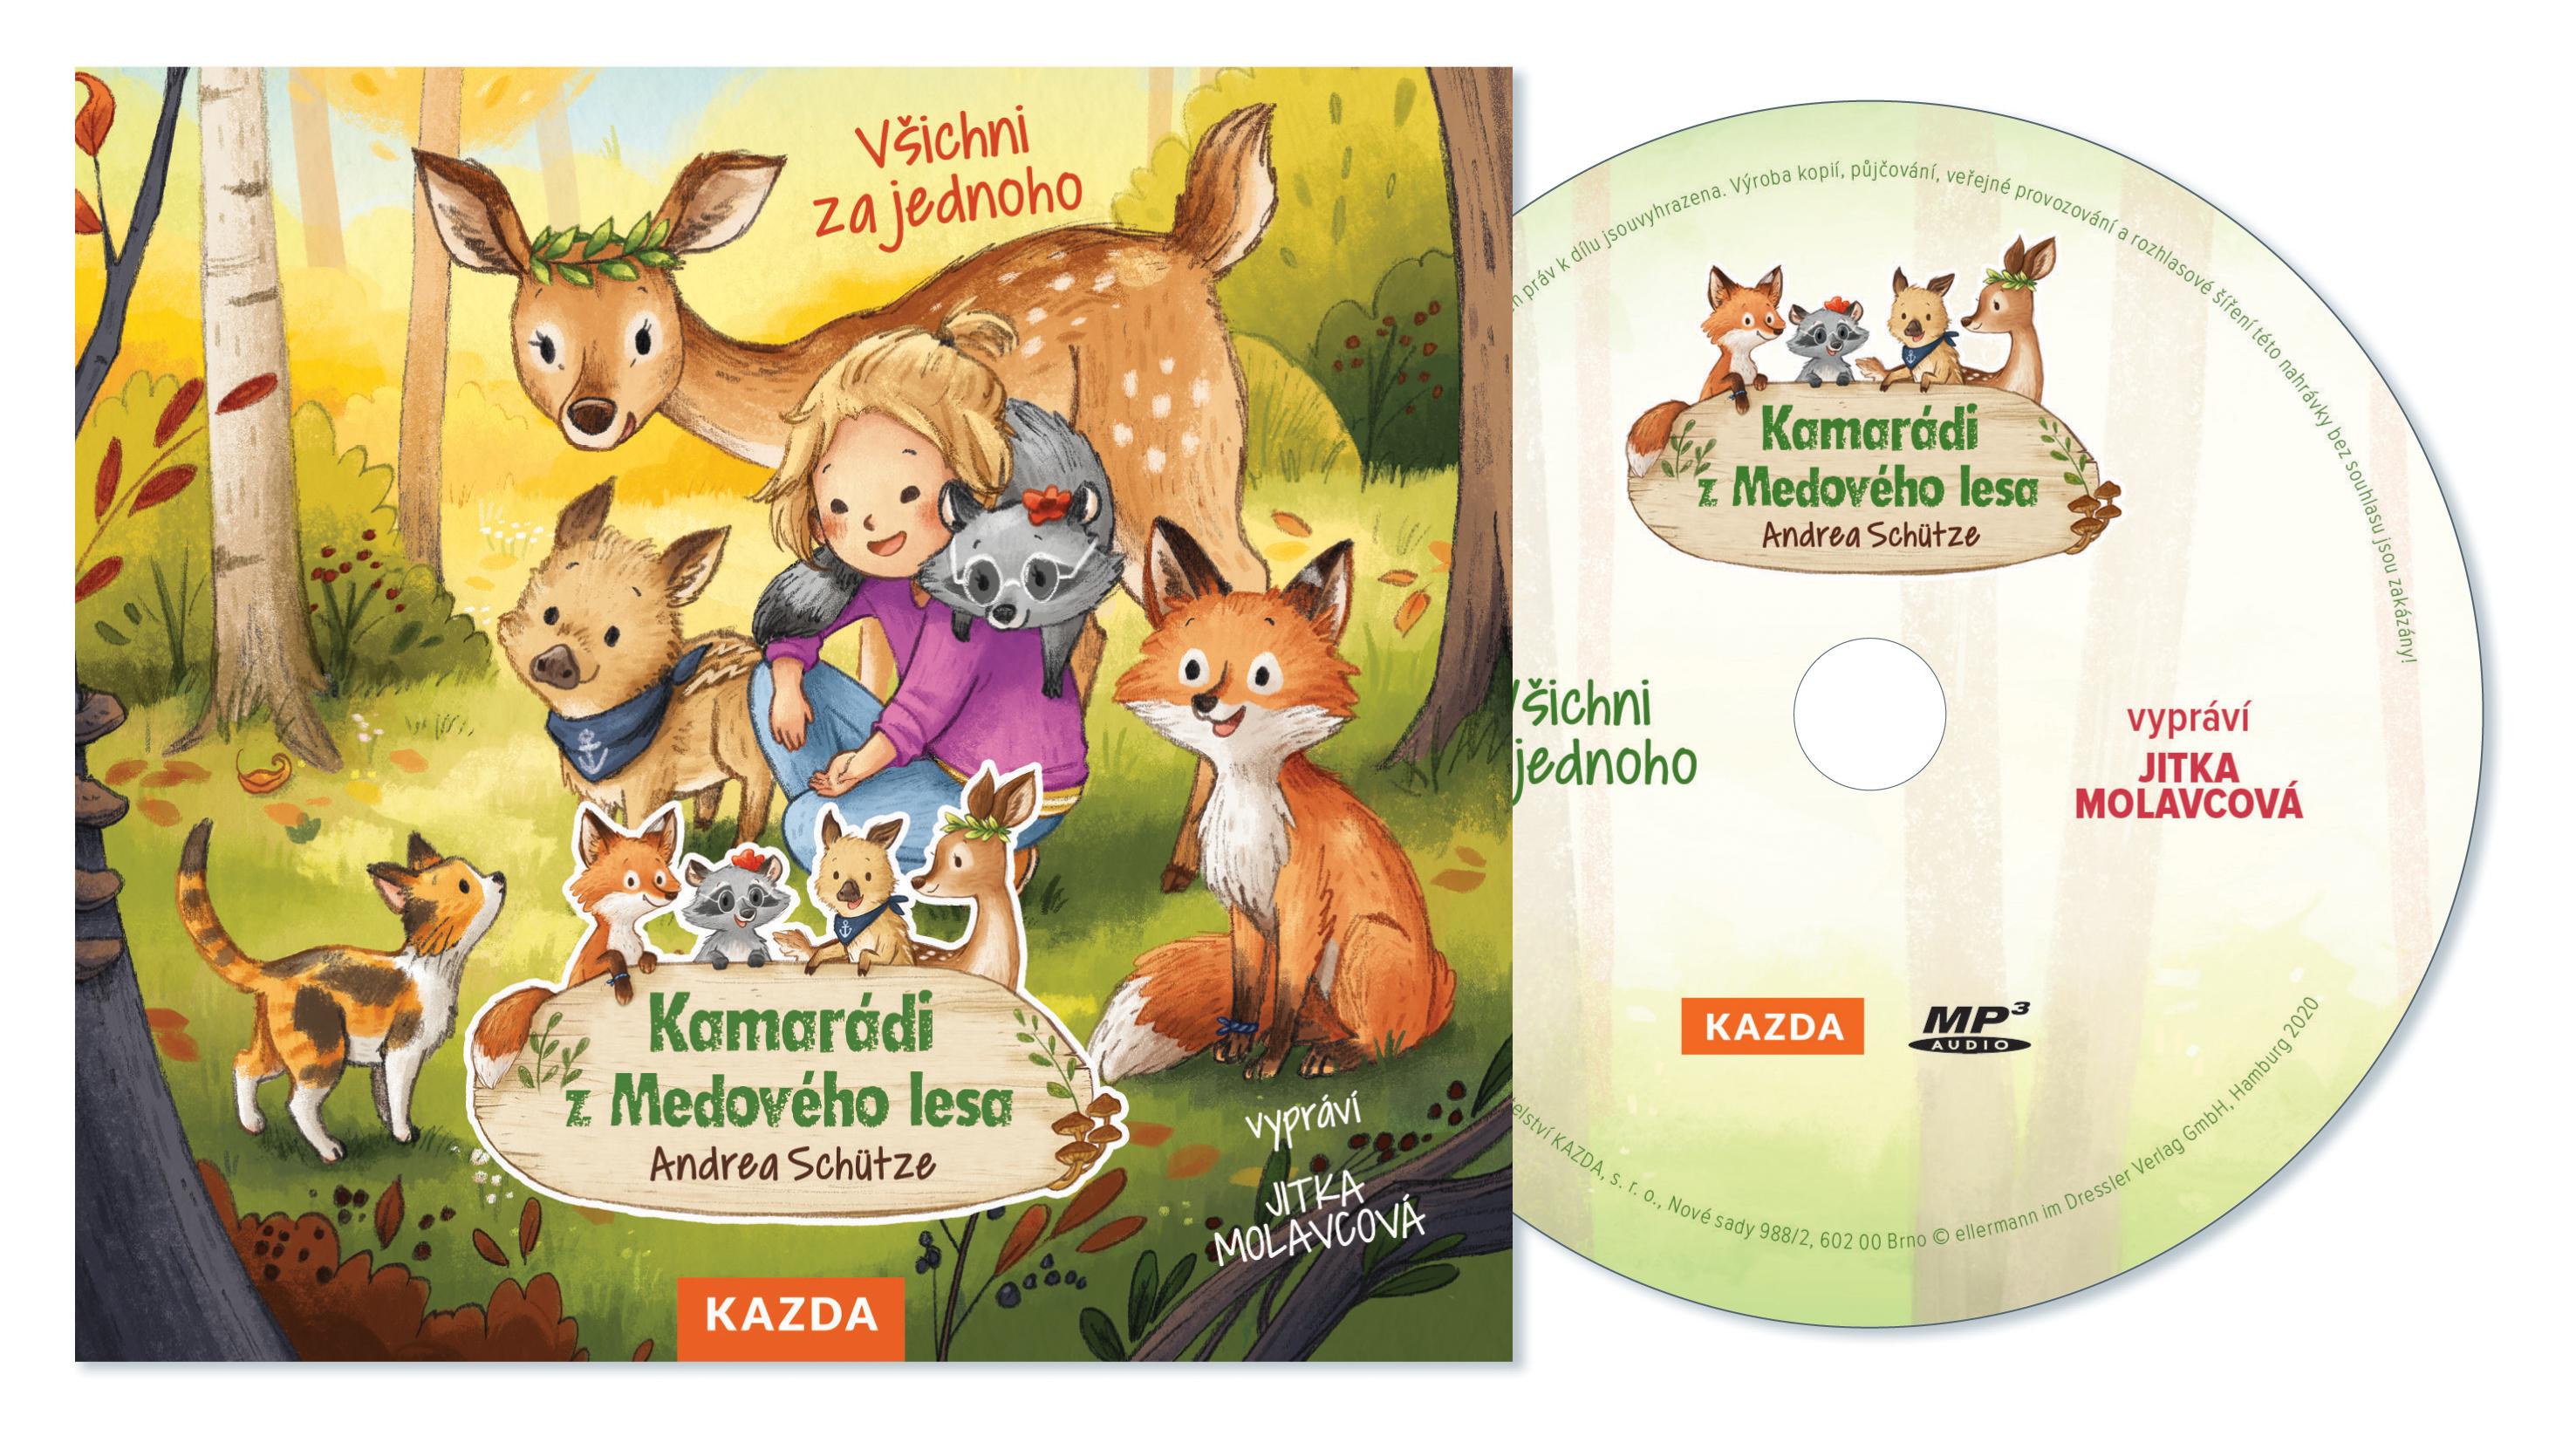 3D+CD_audio_3_VsichniZaJednoho_72DPI